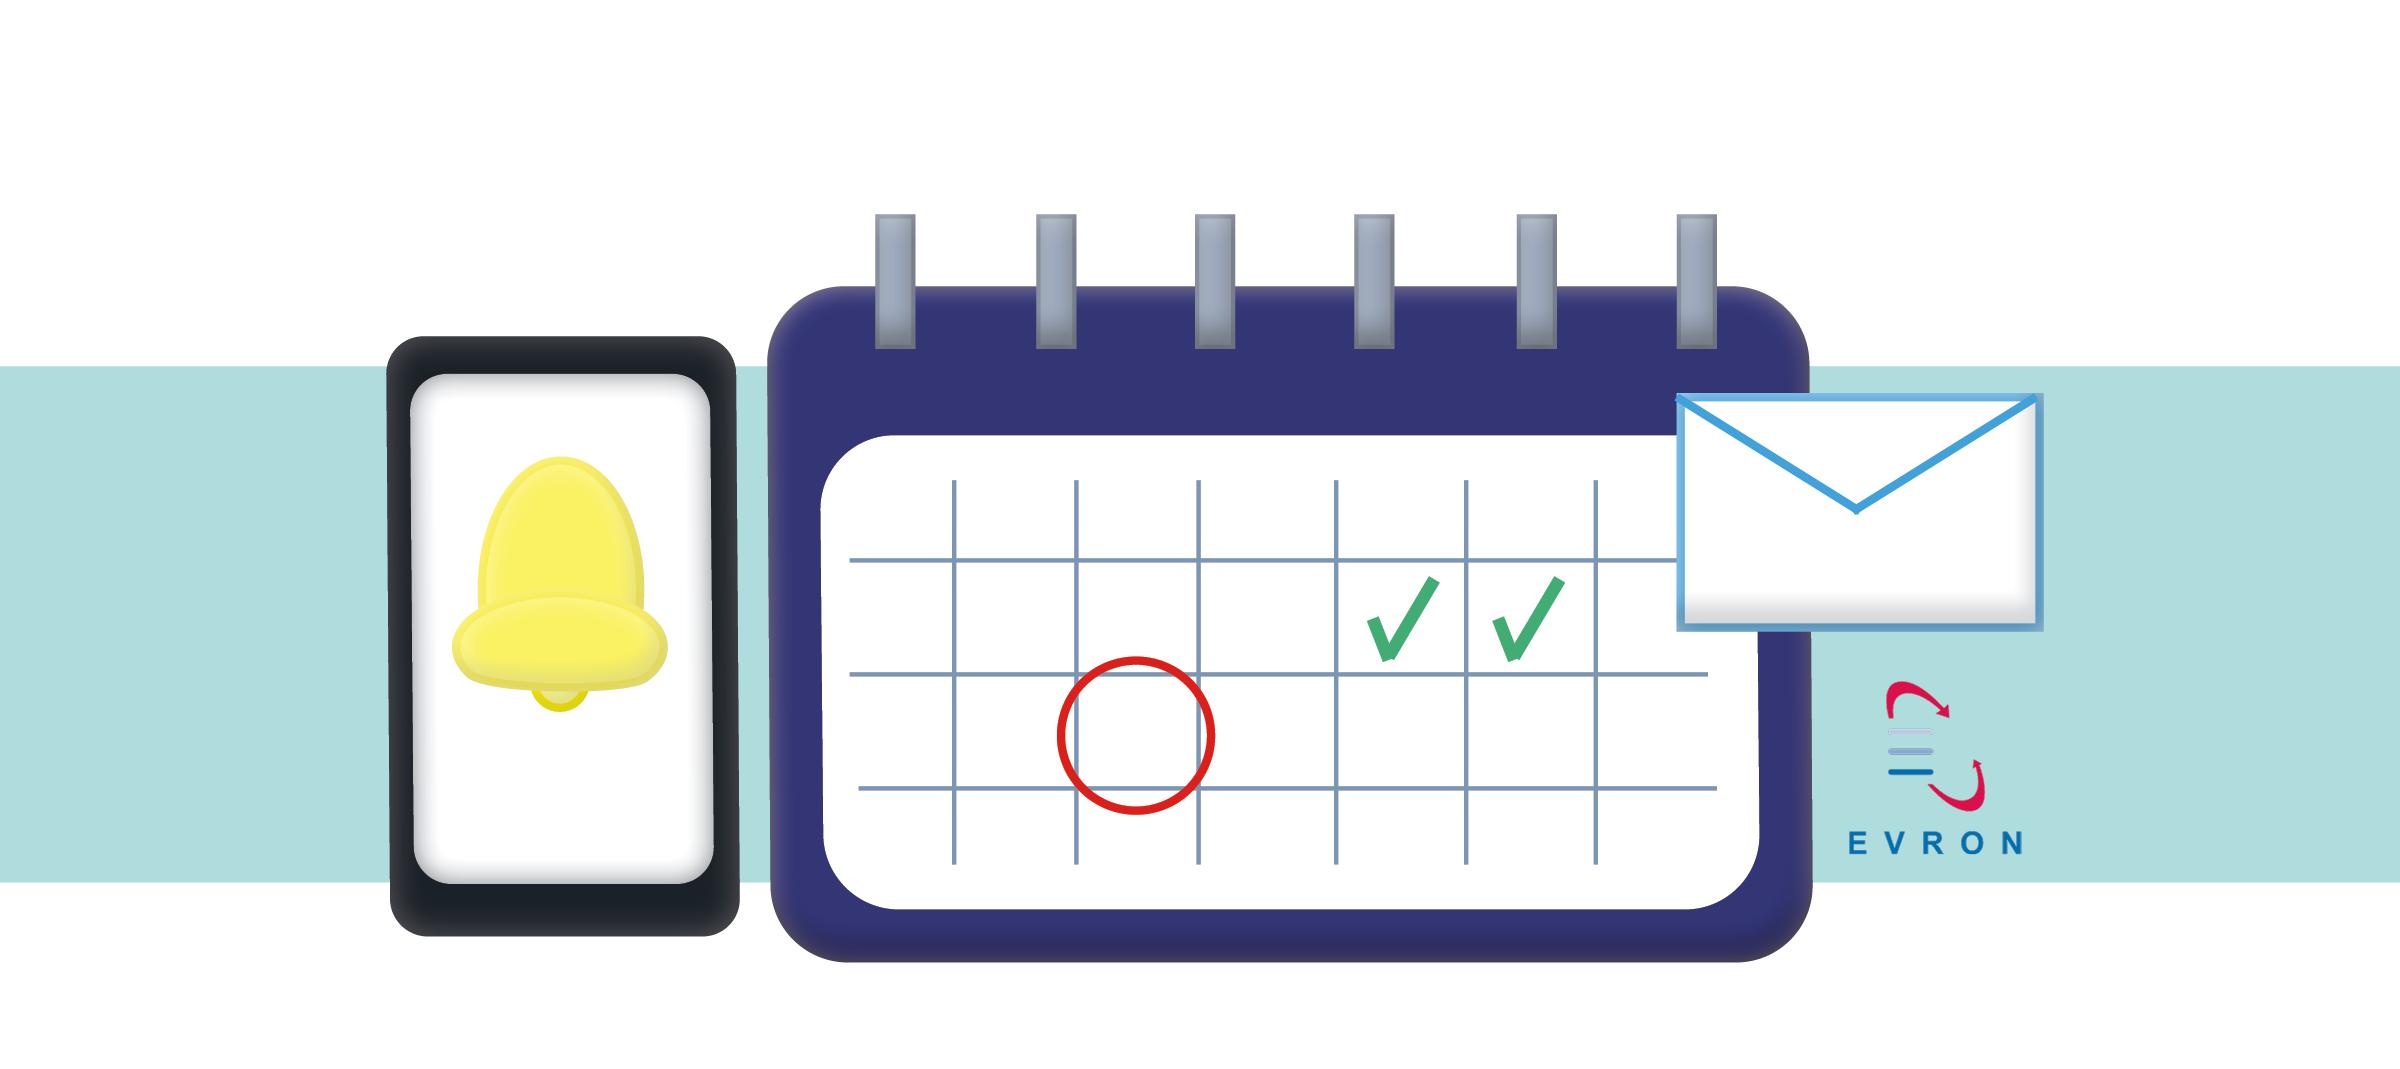 Calendar and phone alert illustration